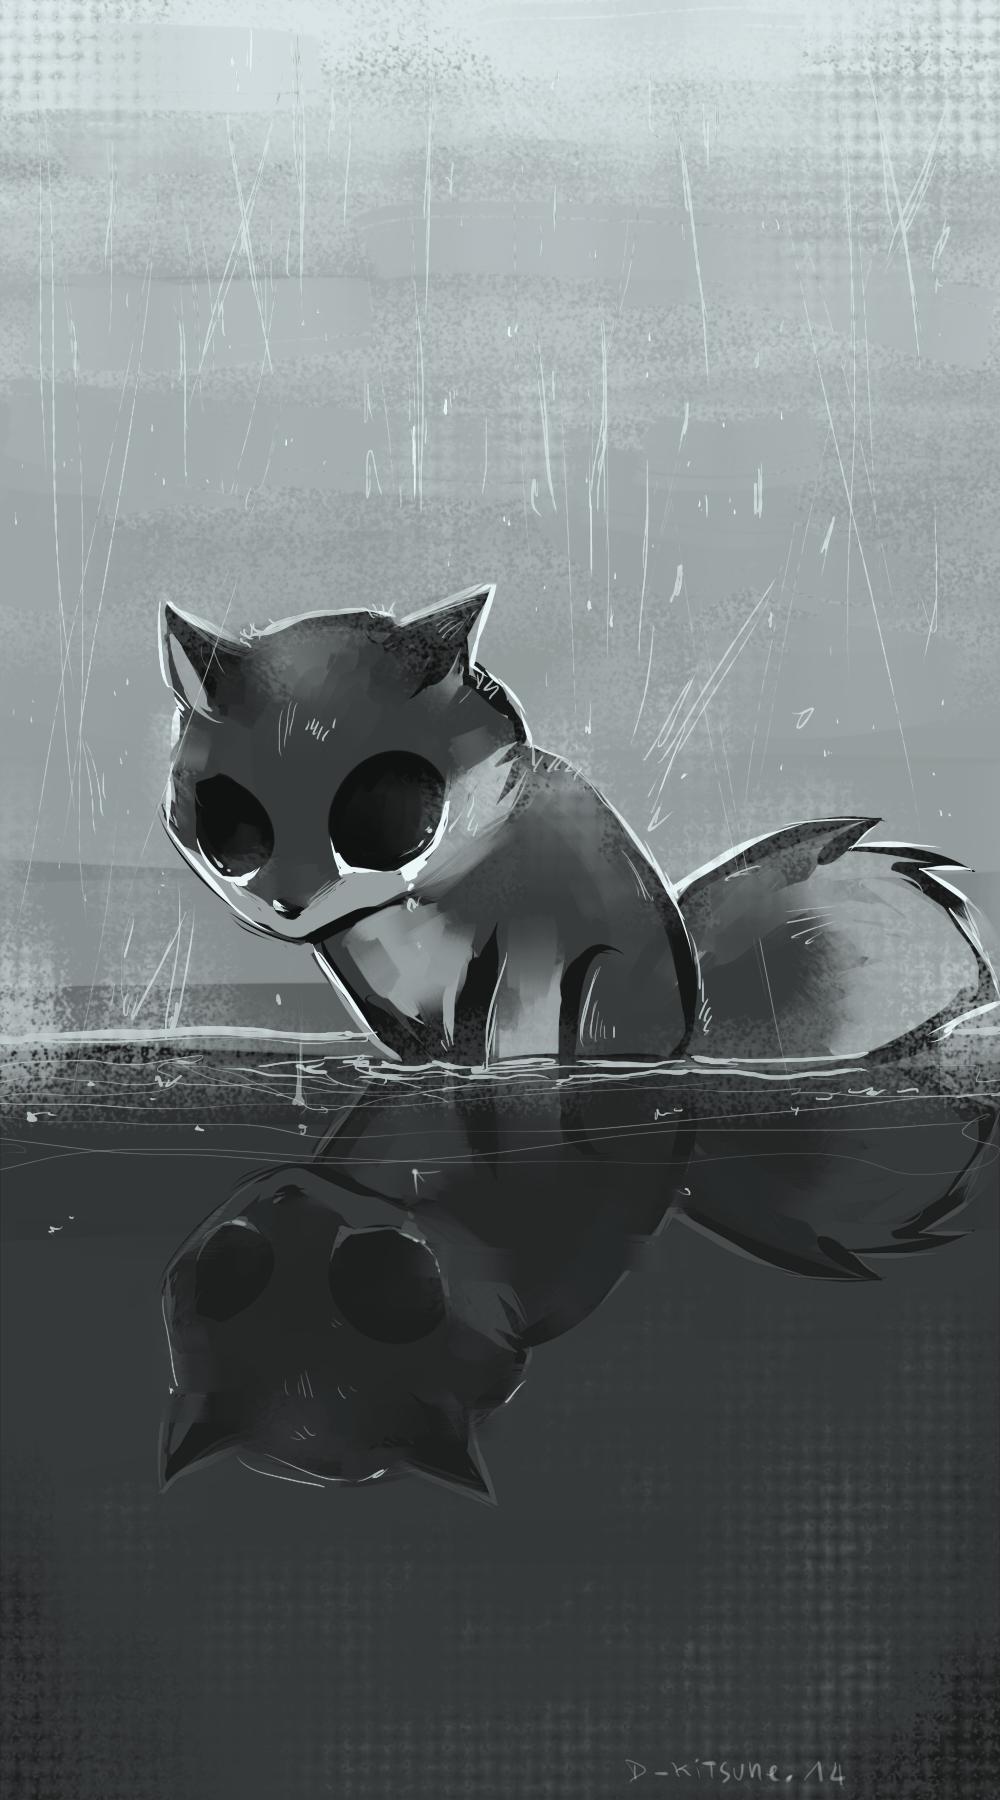 Dark Kitsune by D-Kitsune on deviantART